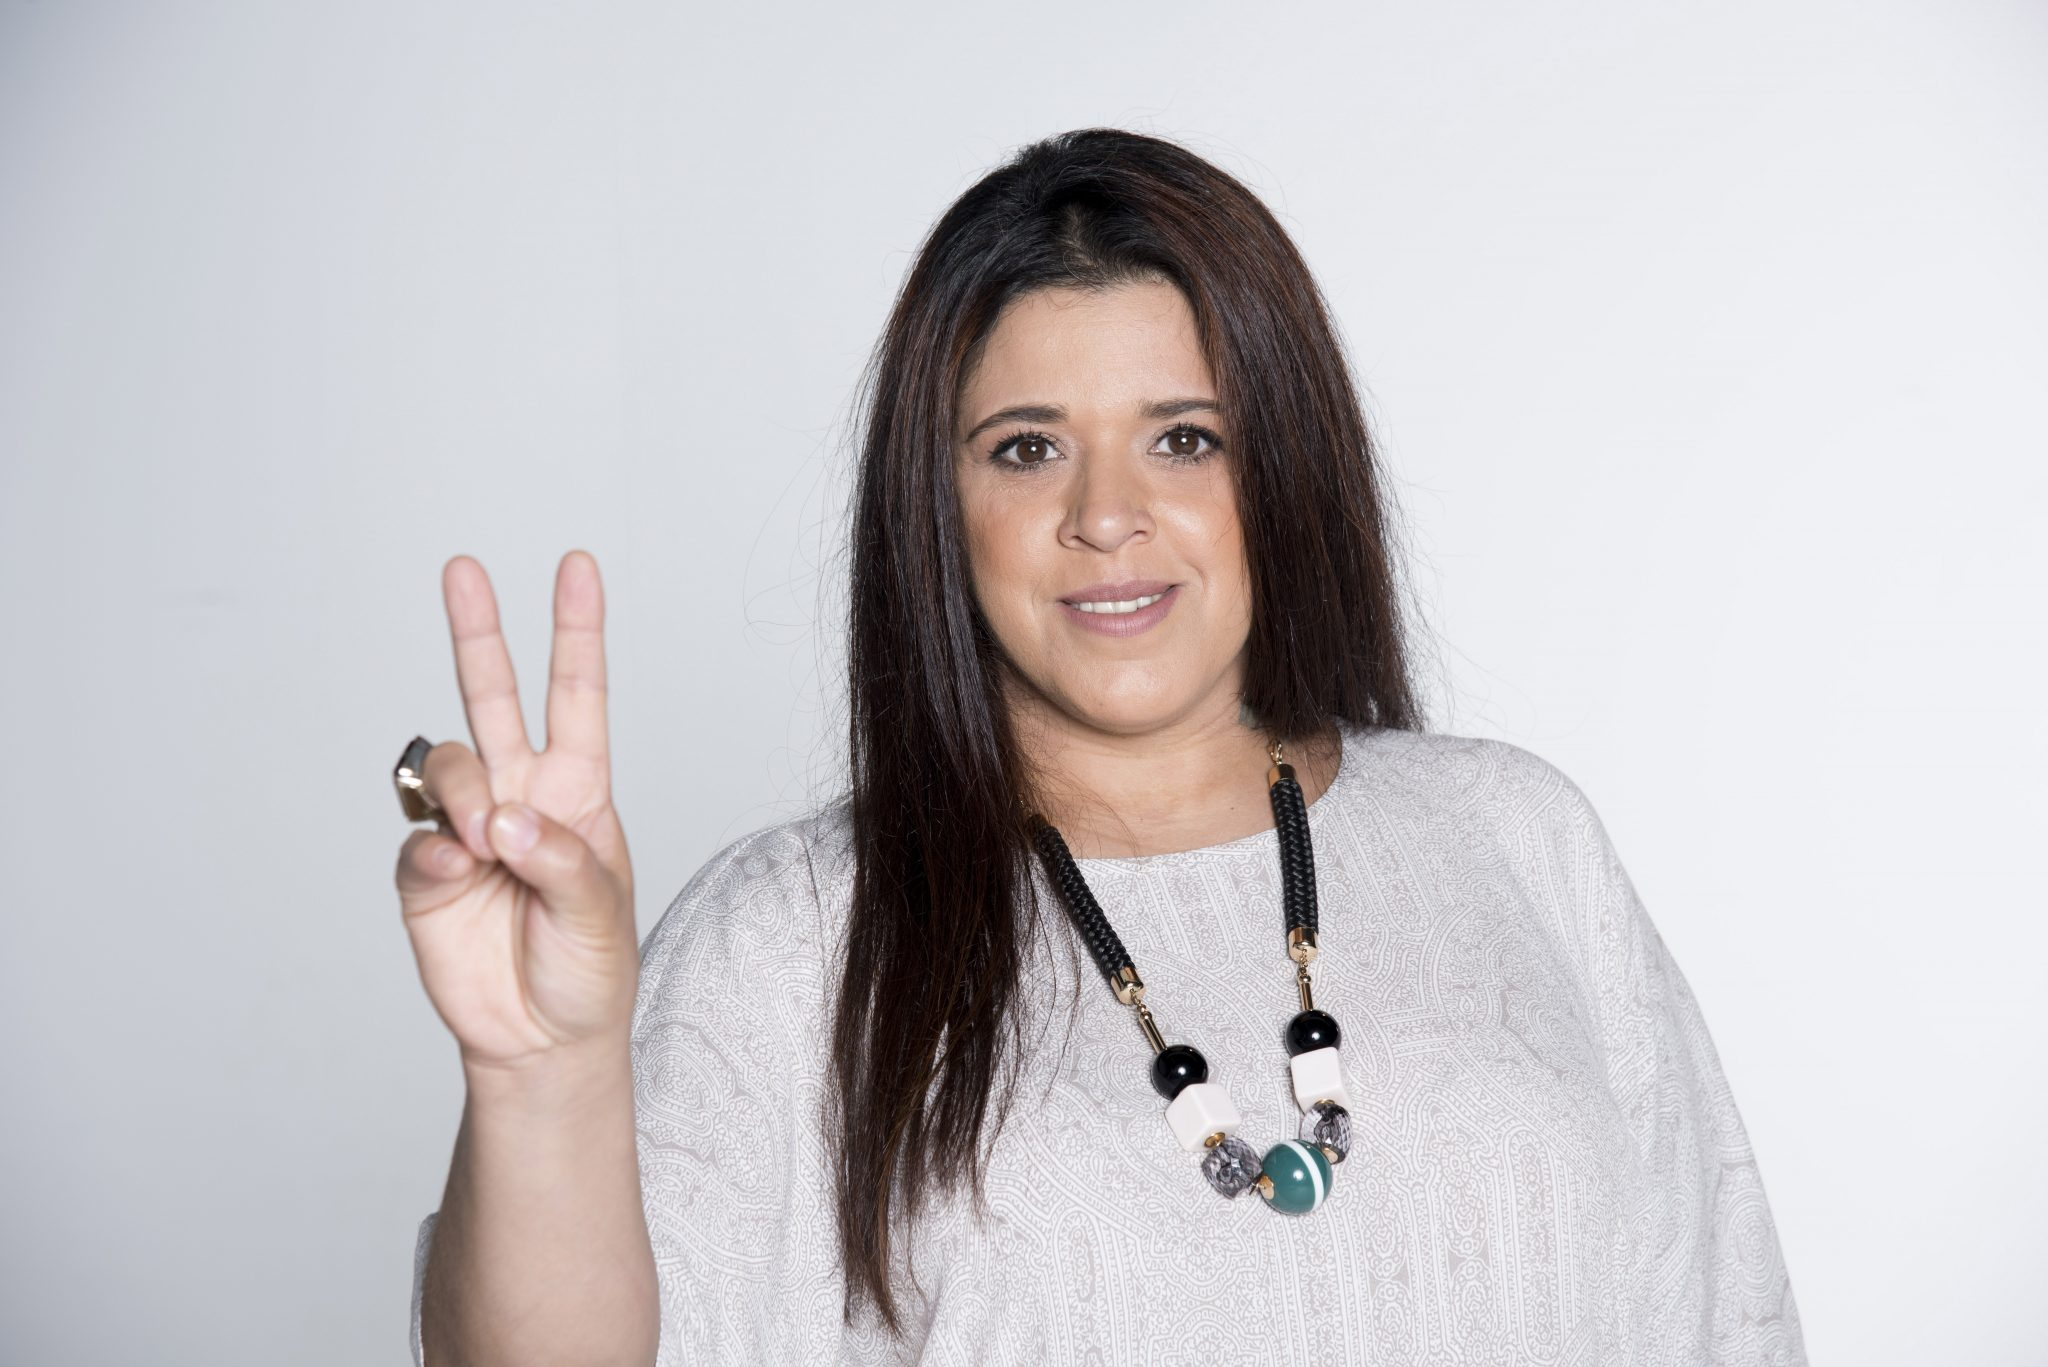 Célia Lawson